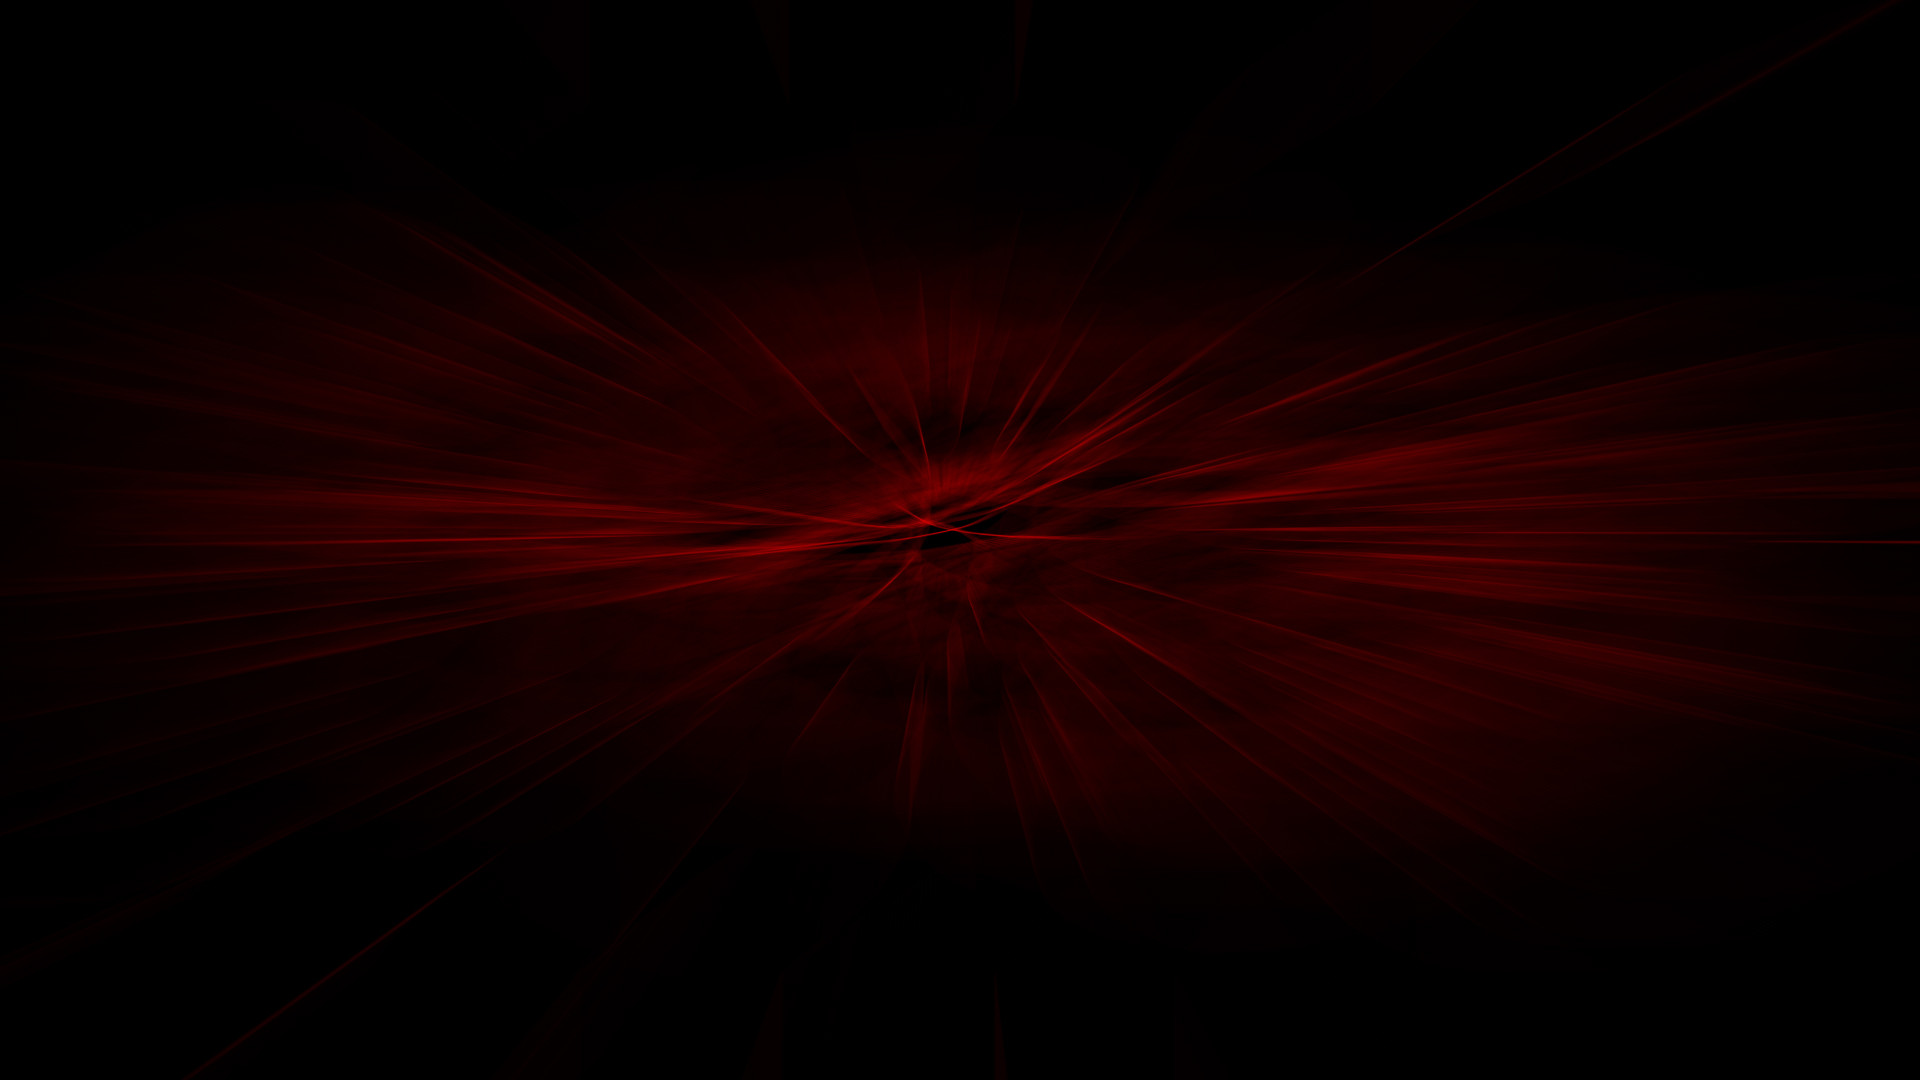 … red and black wallpaper designs 14 background hdblackwallpaper com …